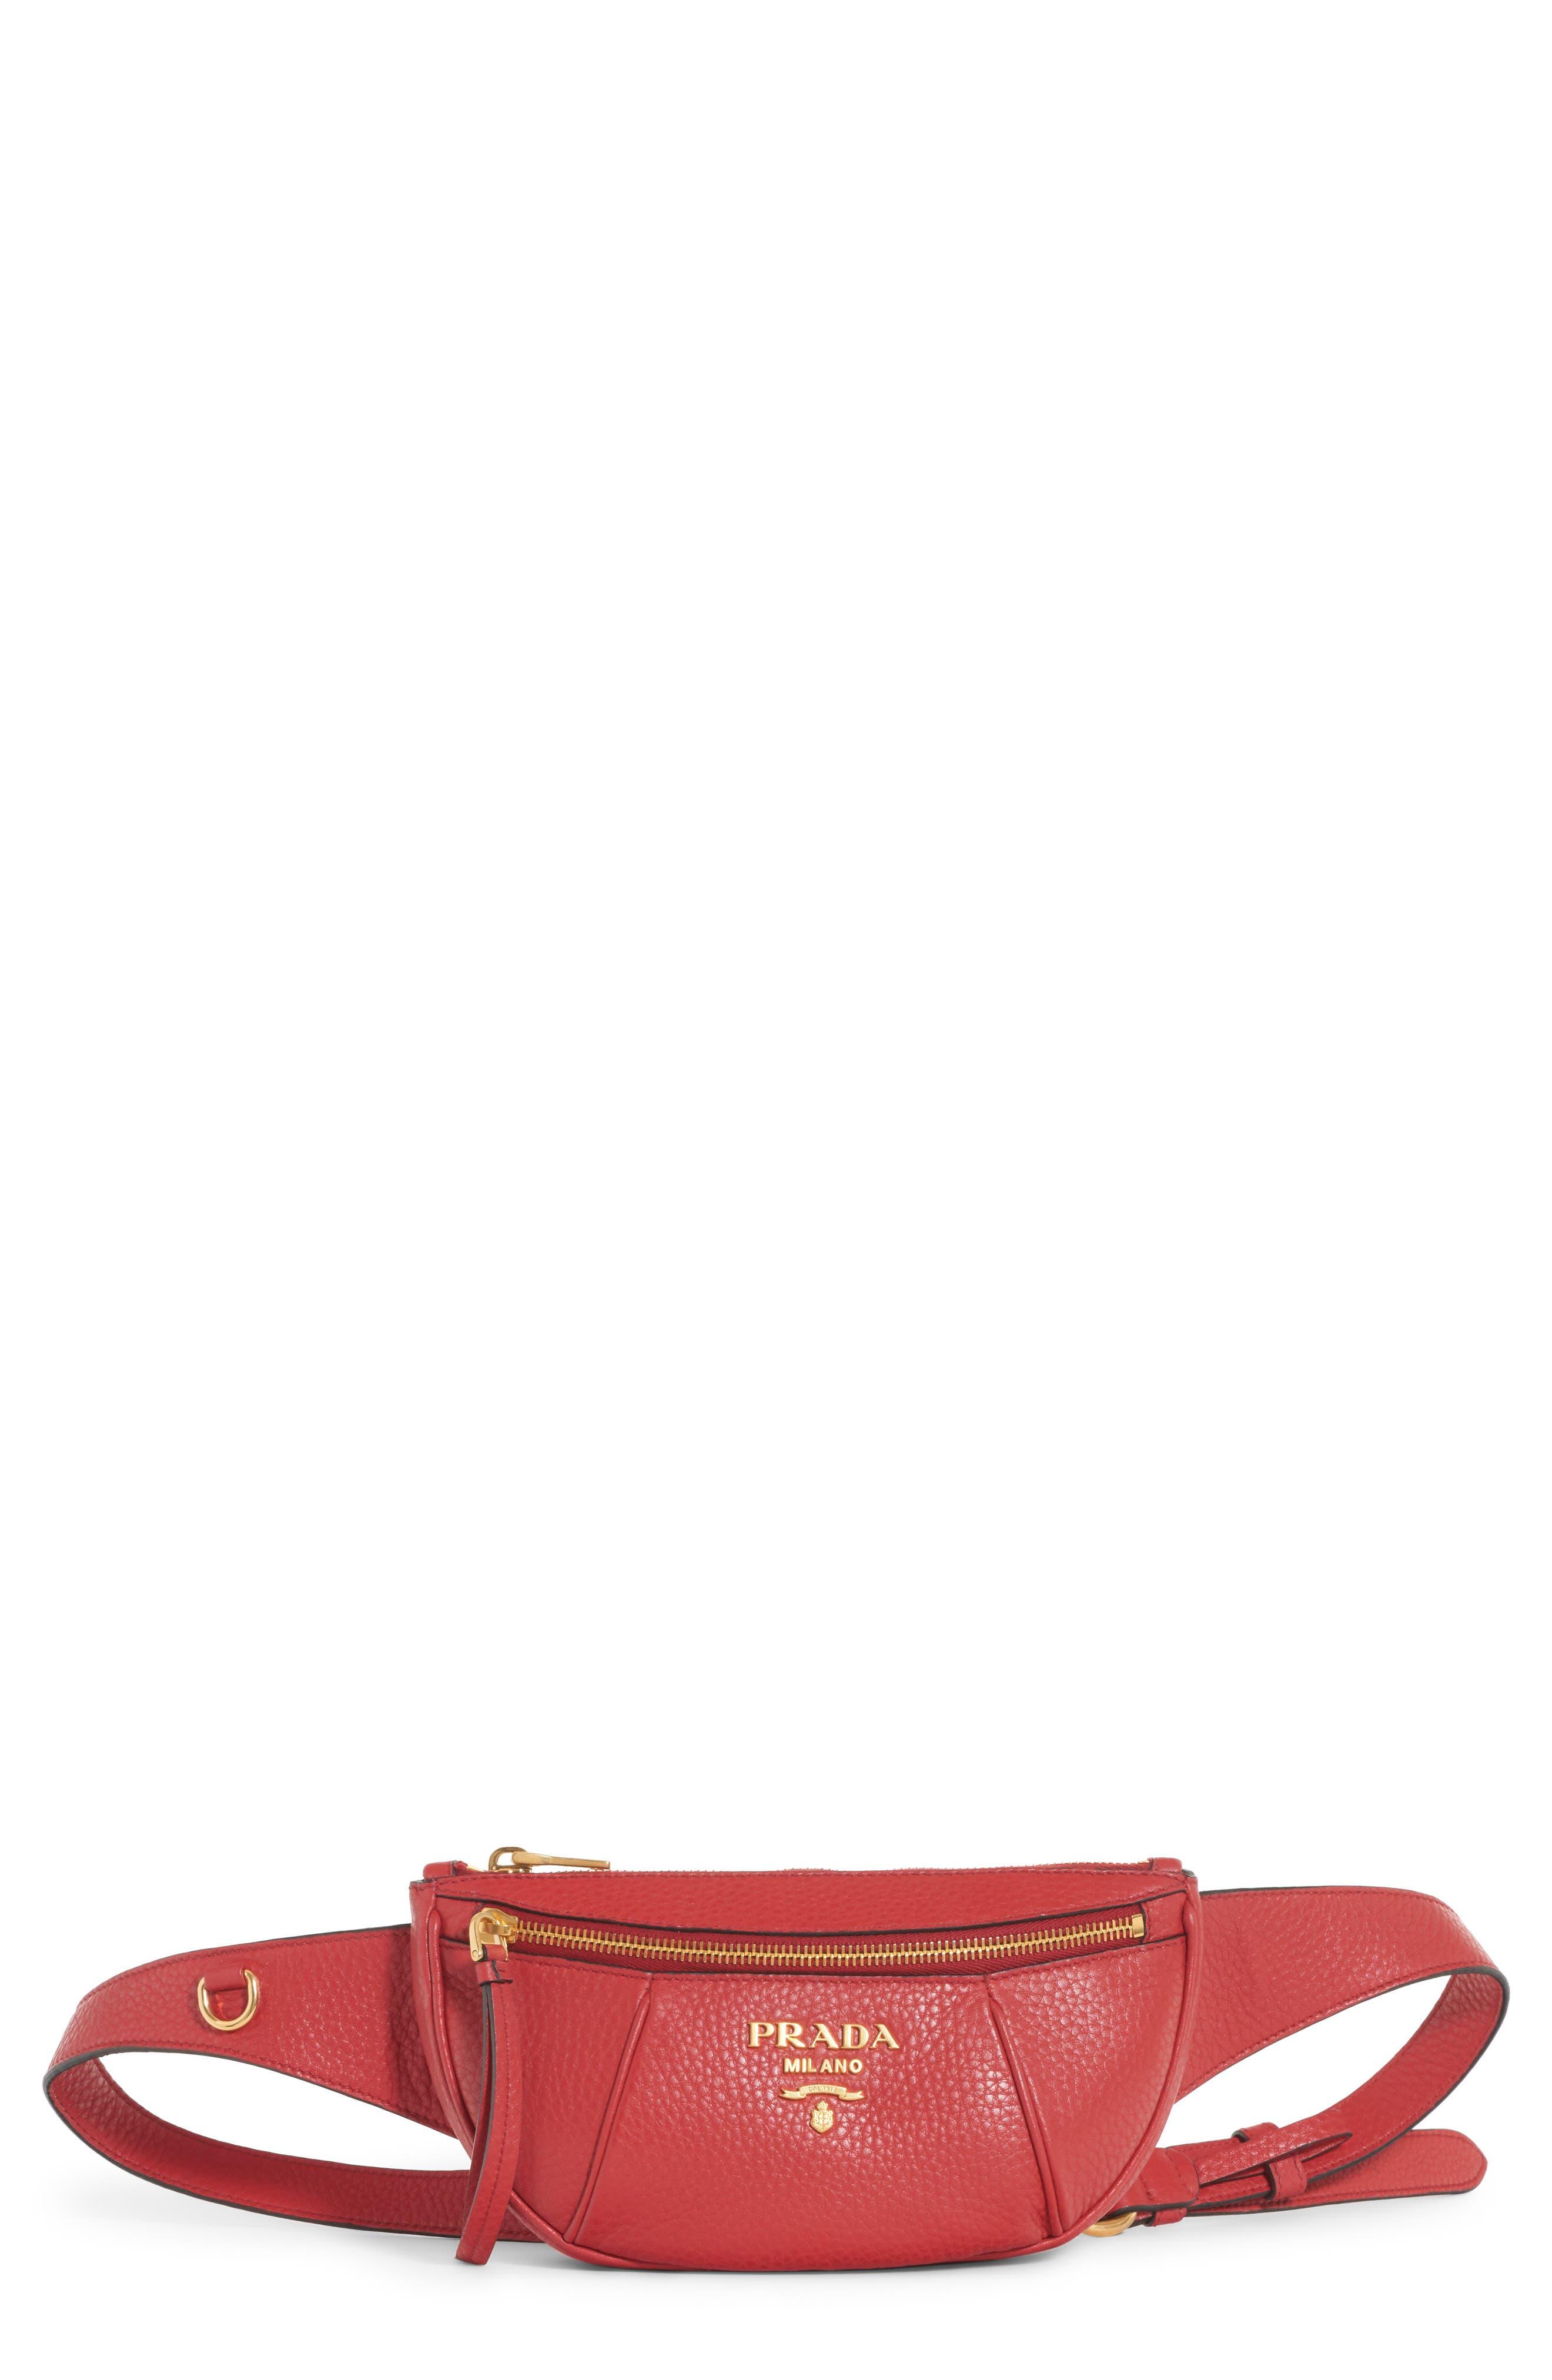 Prada Daino Leather Belt Bag